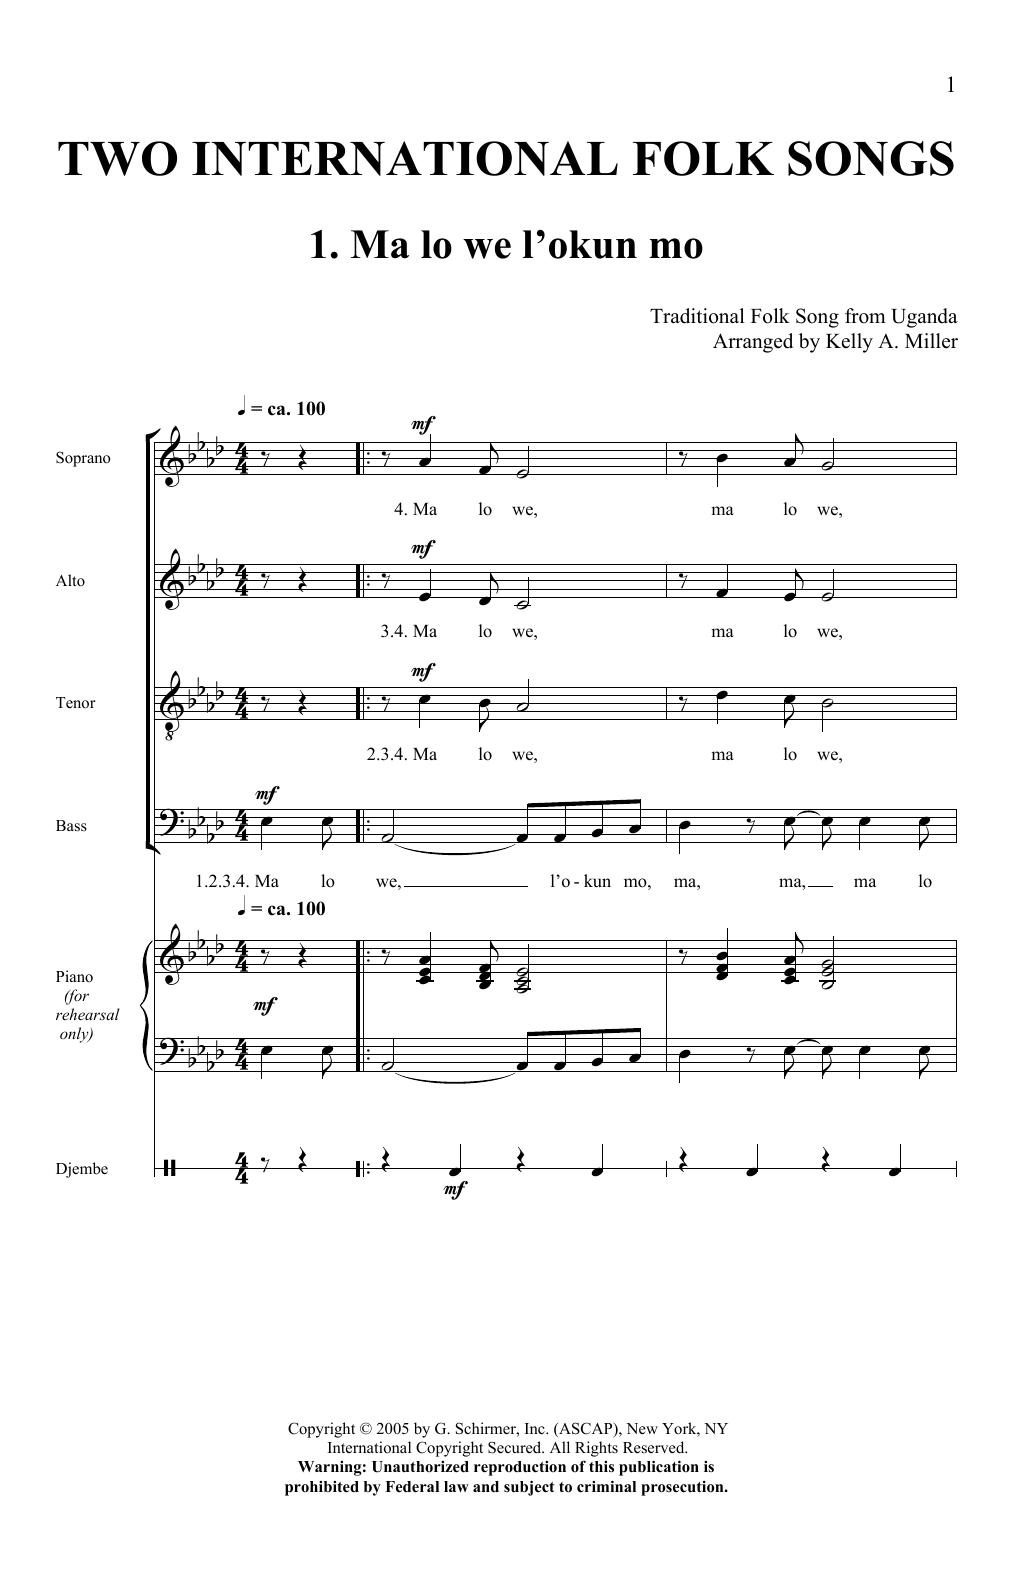 Two International Folk Songs Sheet Music